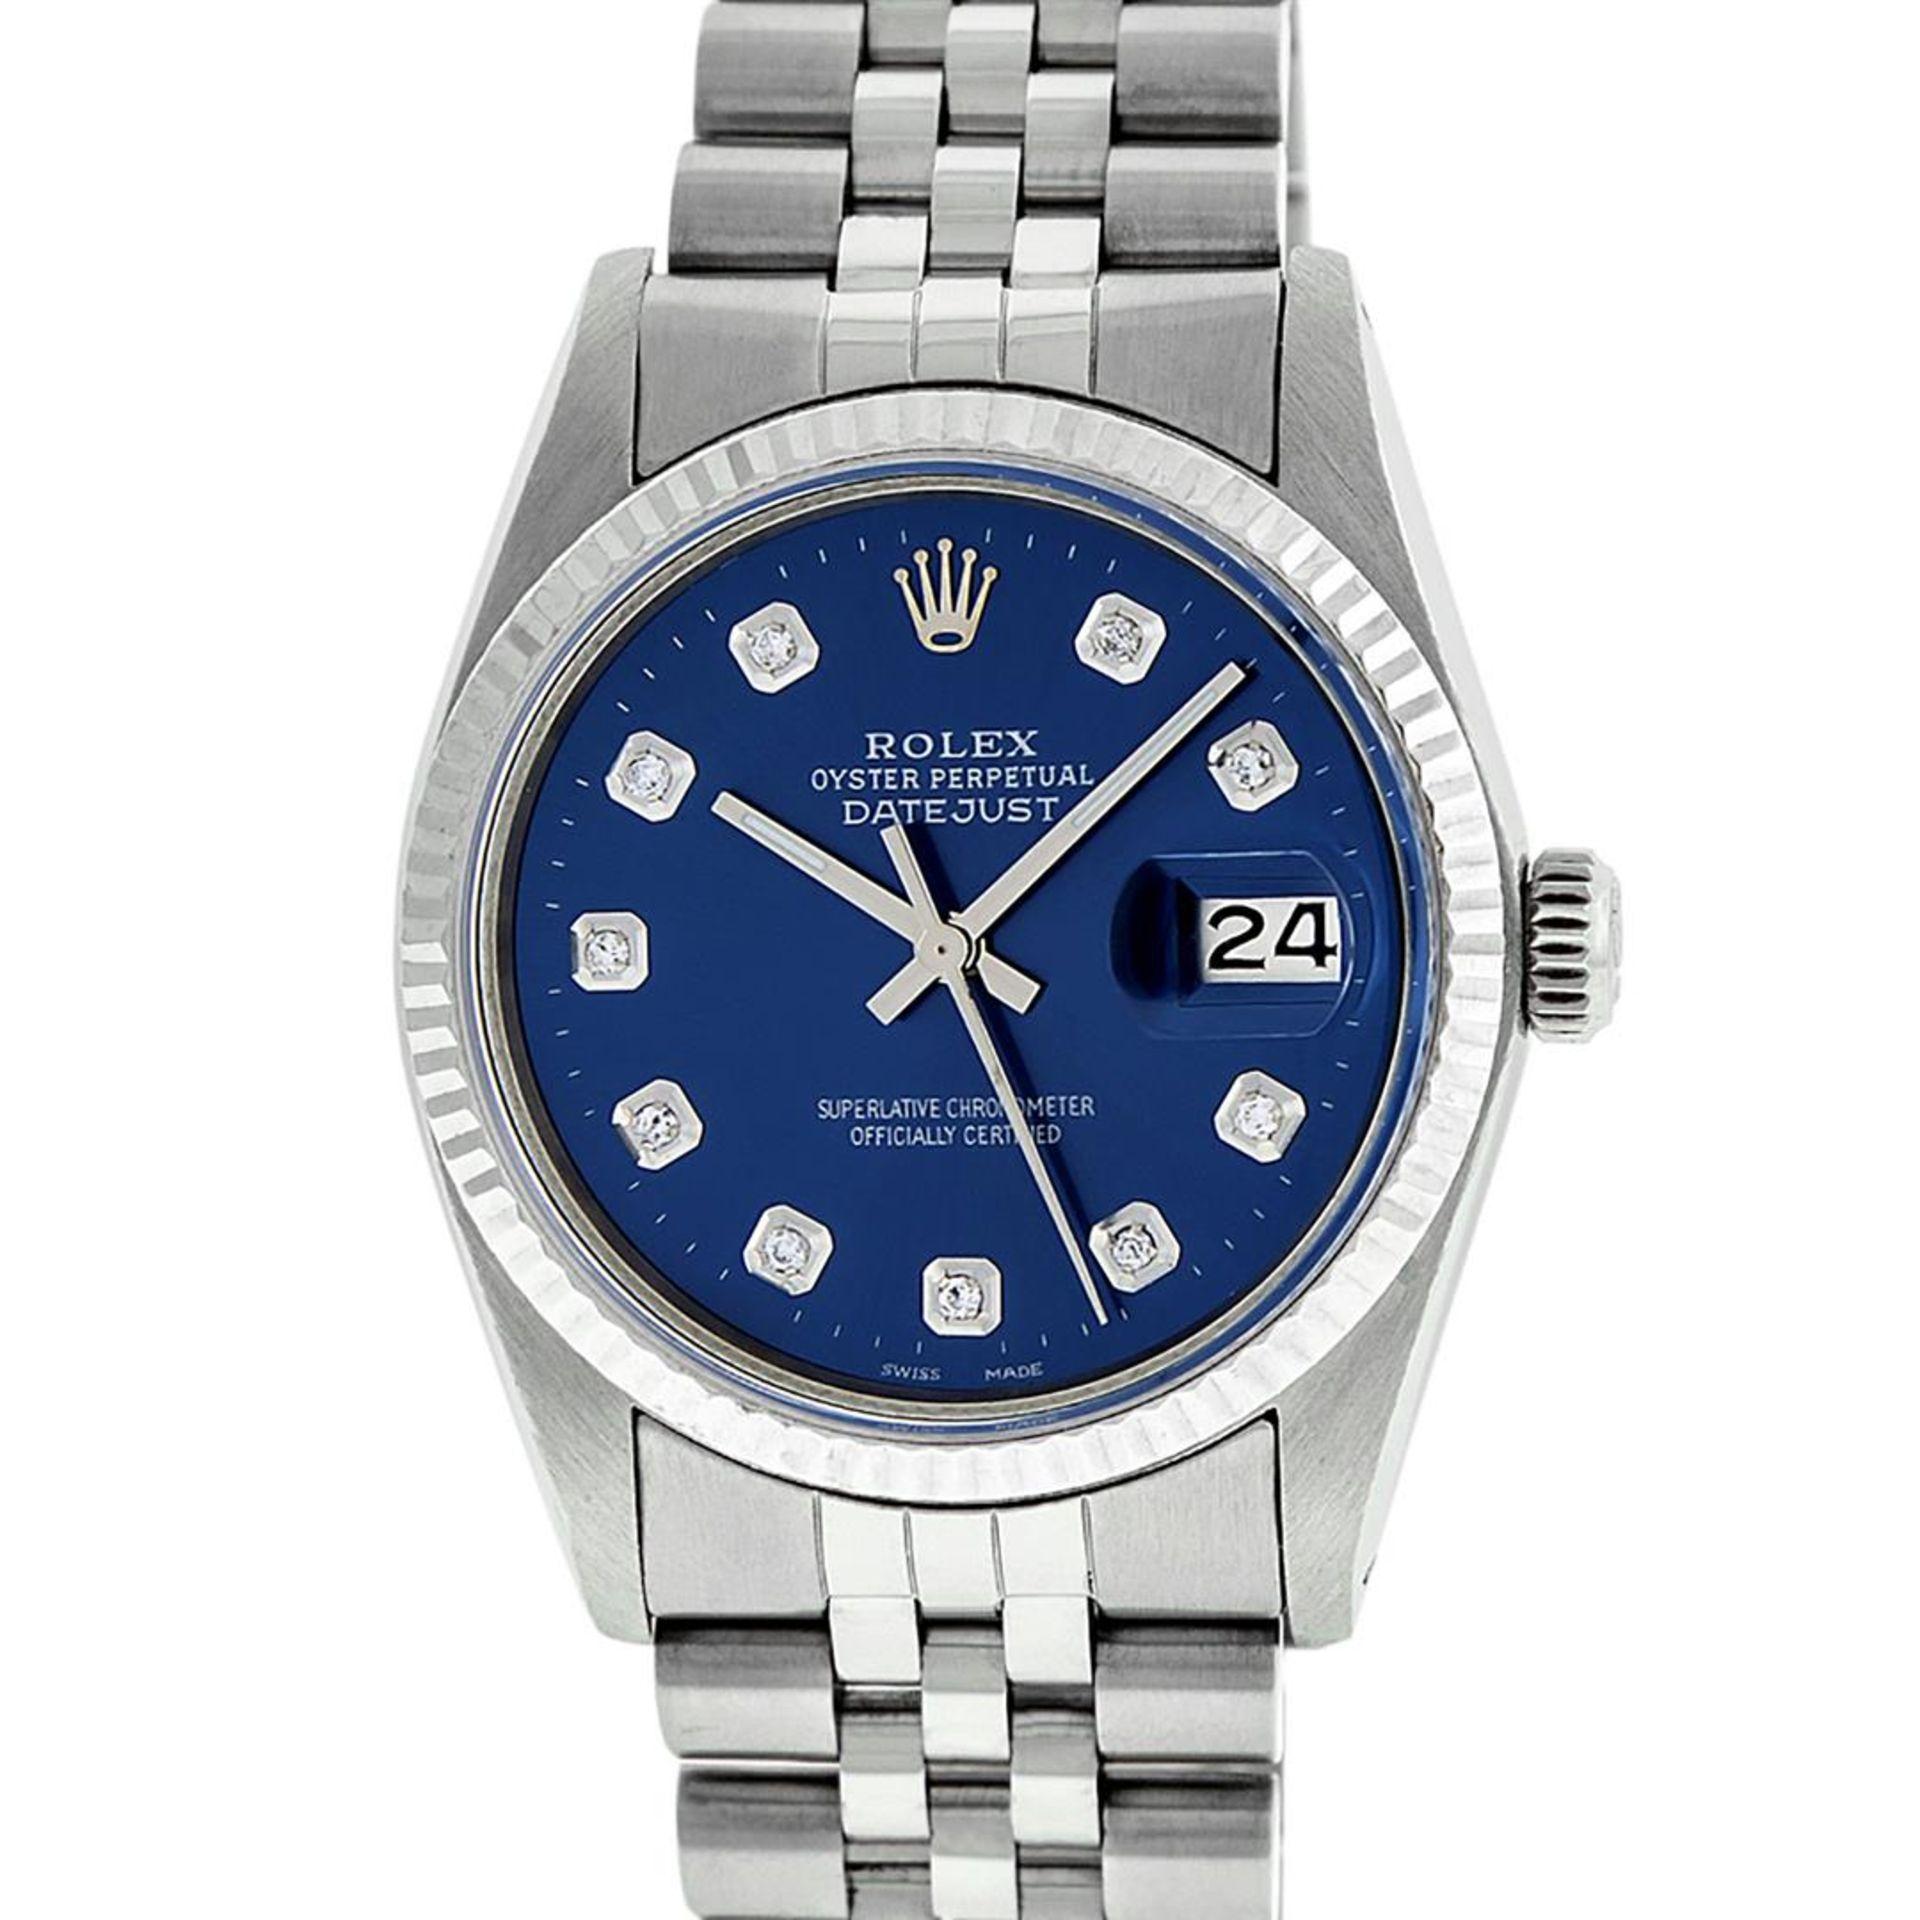 Rolex Mens Stainless Steel 36MM Blue Diamond Datejust Wristwatch - Image 3 of 9